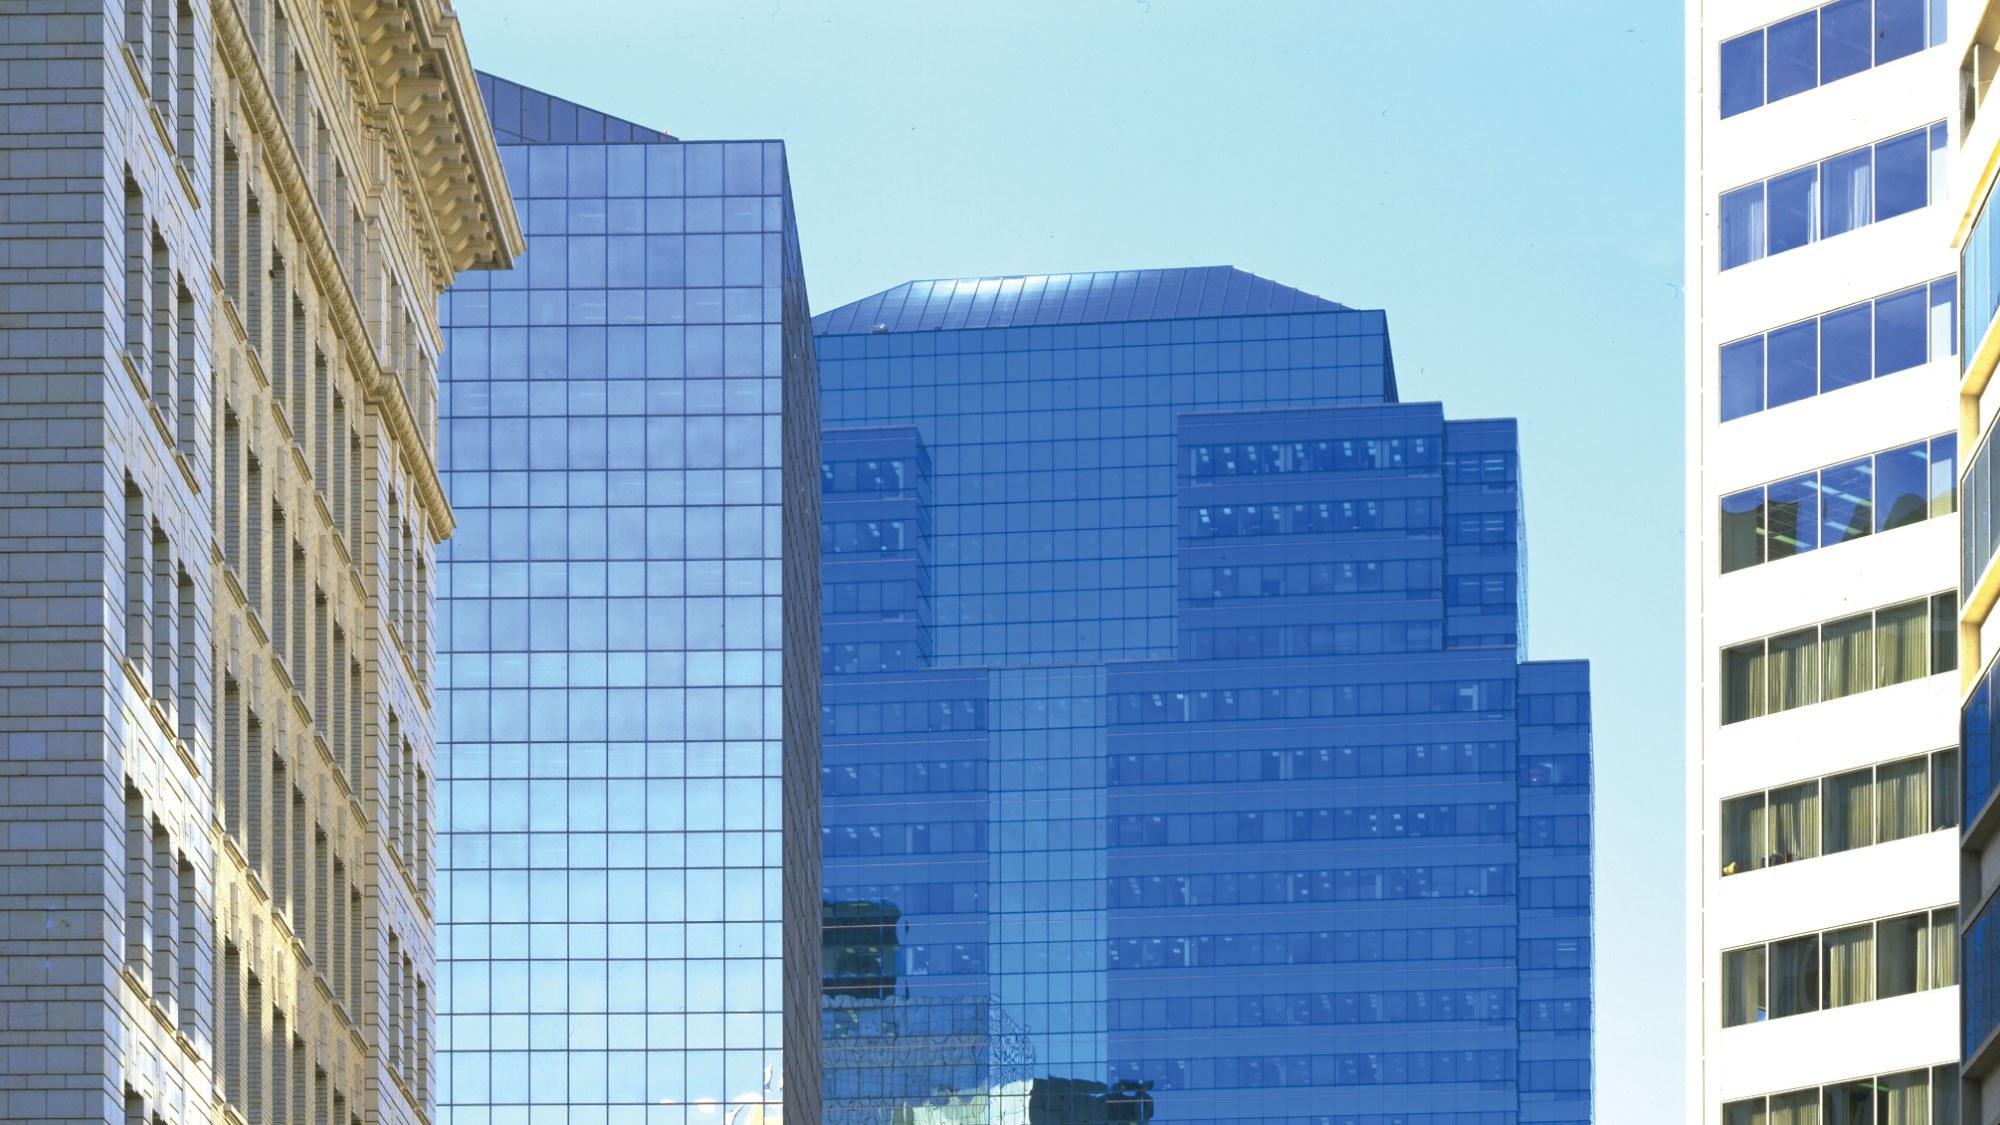 Servus Credit Union's Corporate Centre